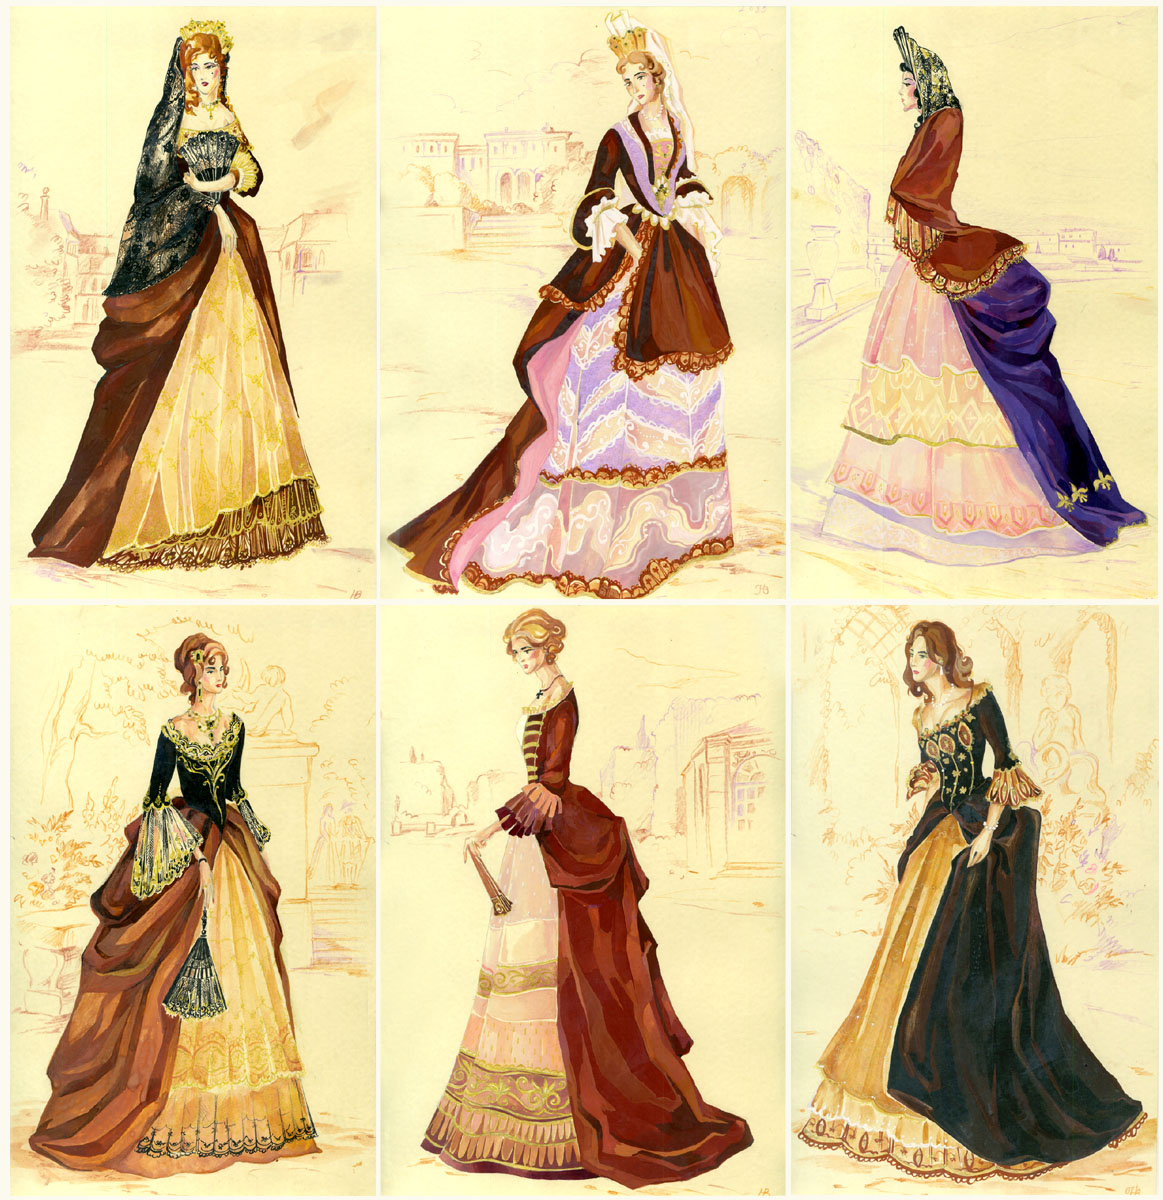 Ladies of 1680s by Callista1981